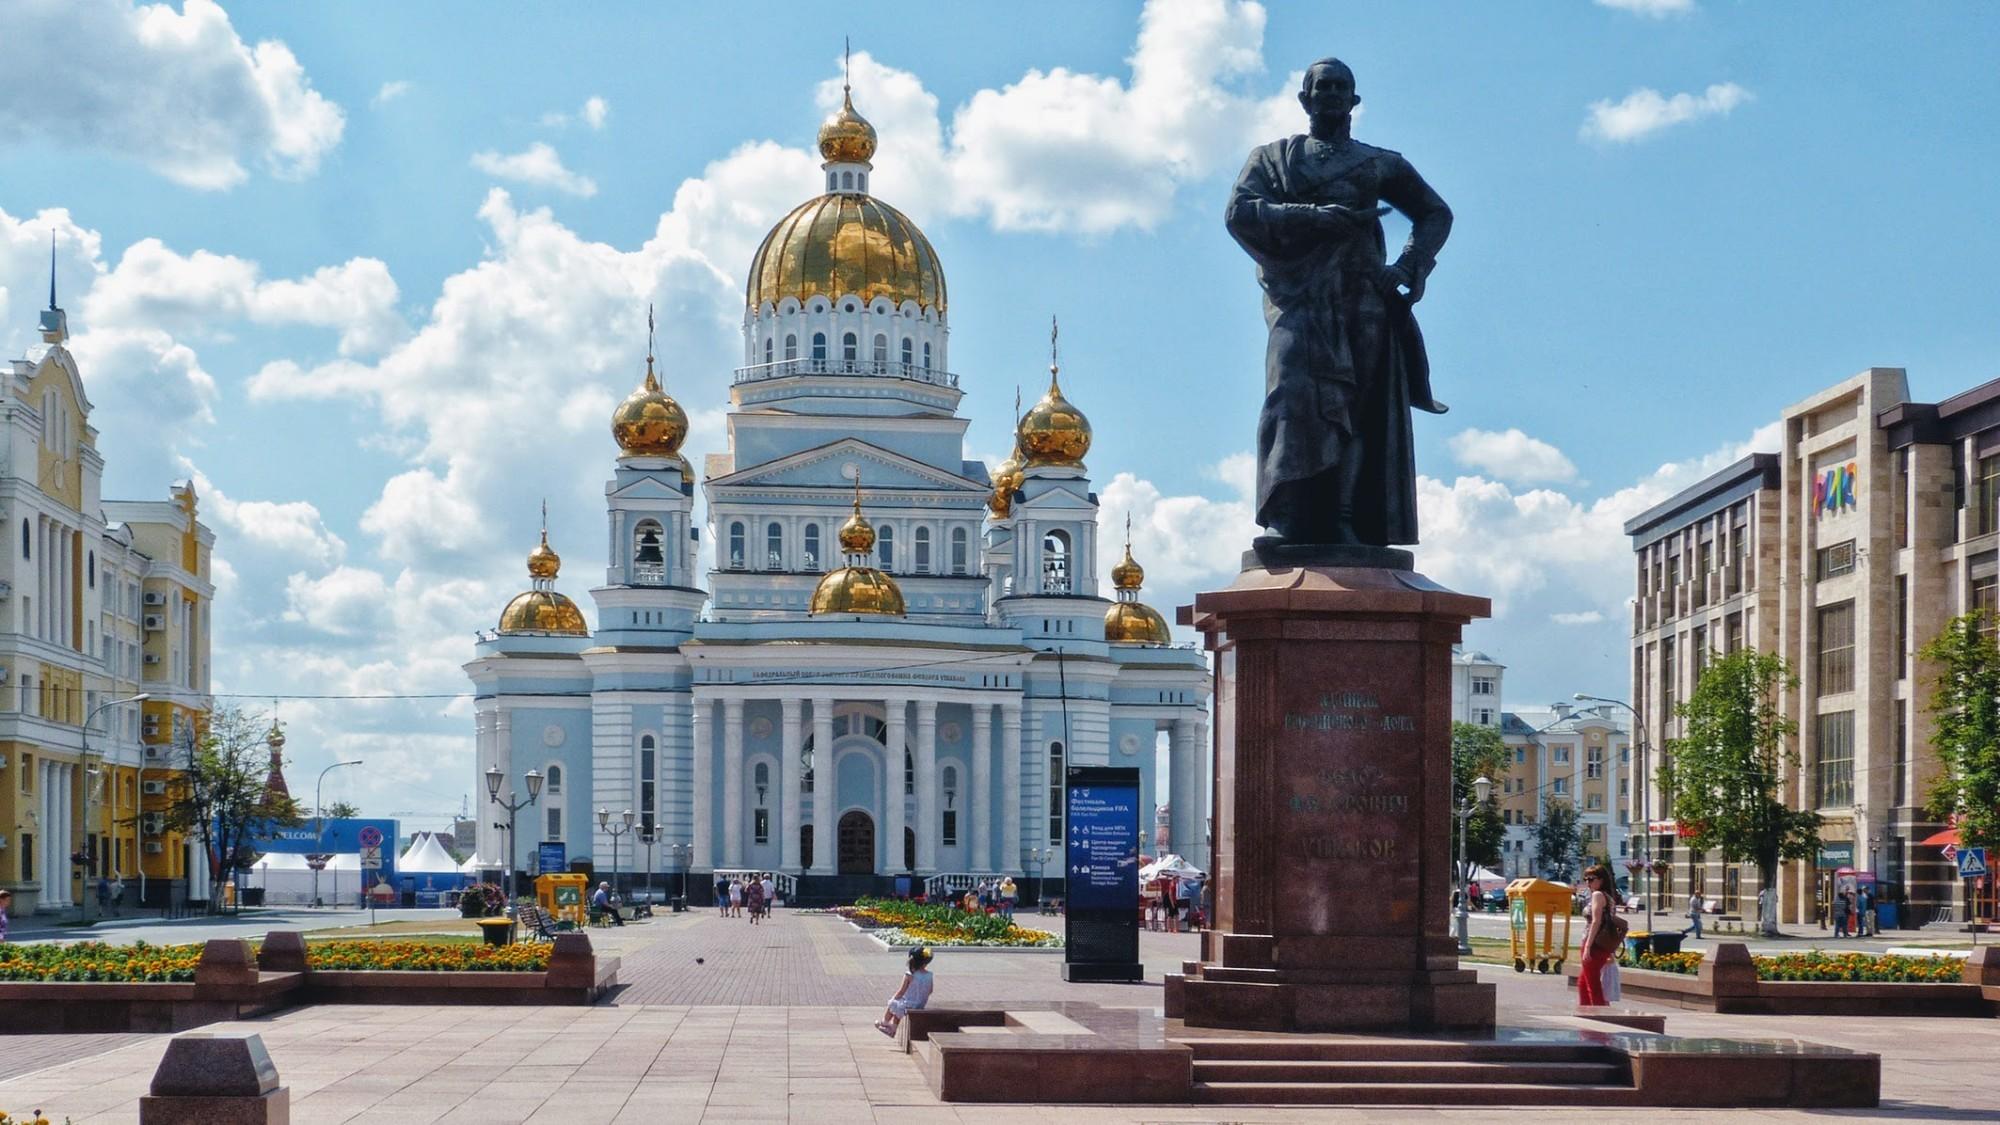 столица мордовии фото помощи датчика